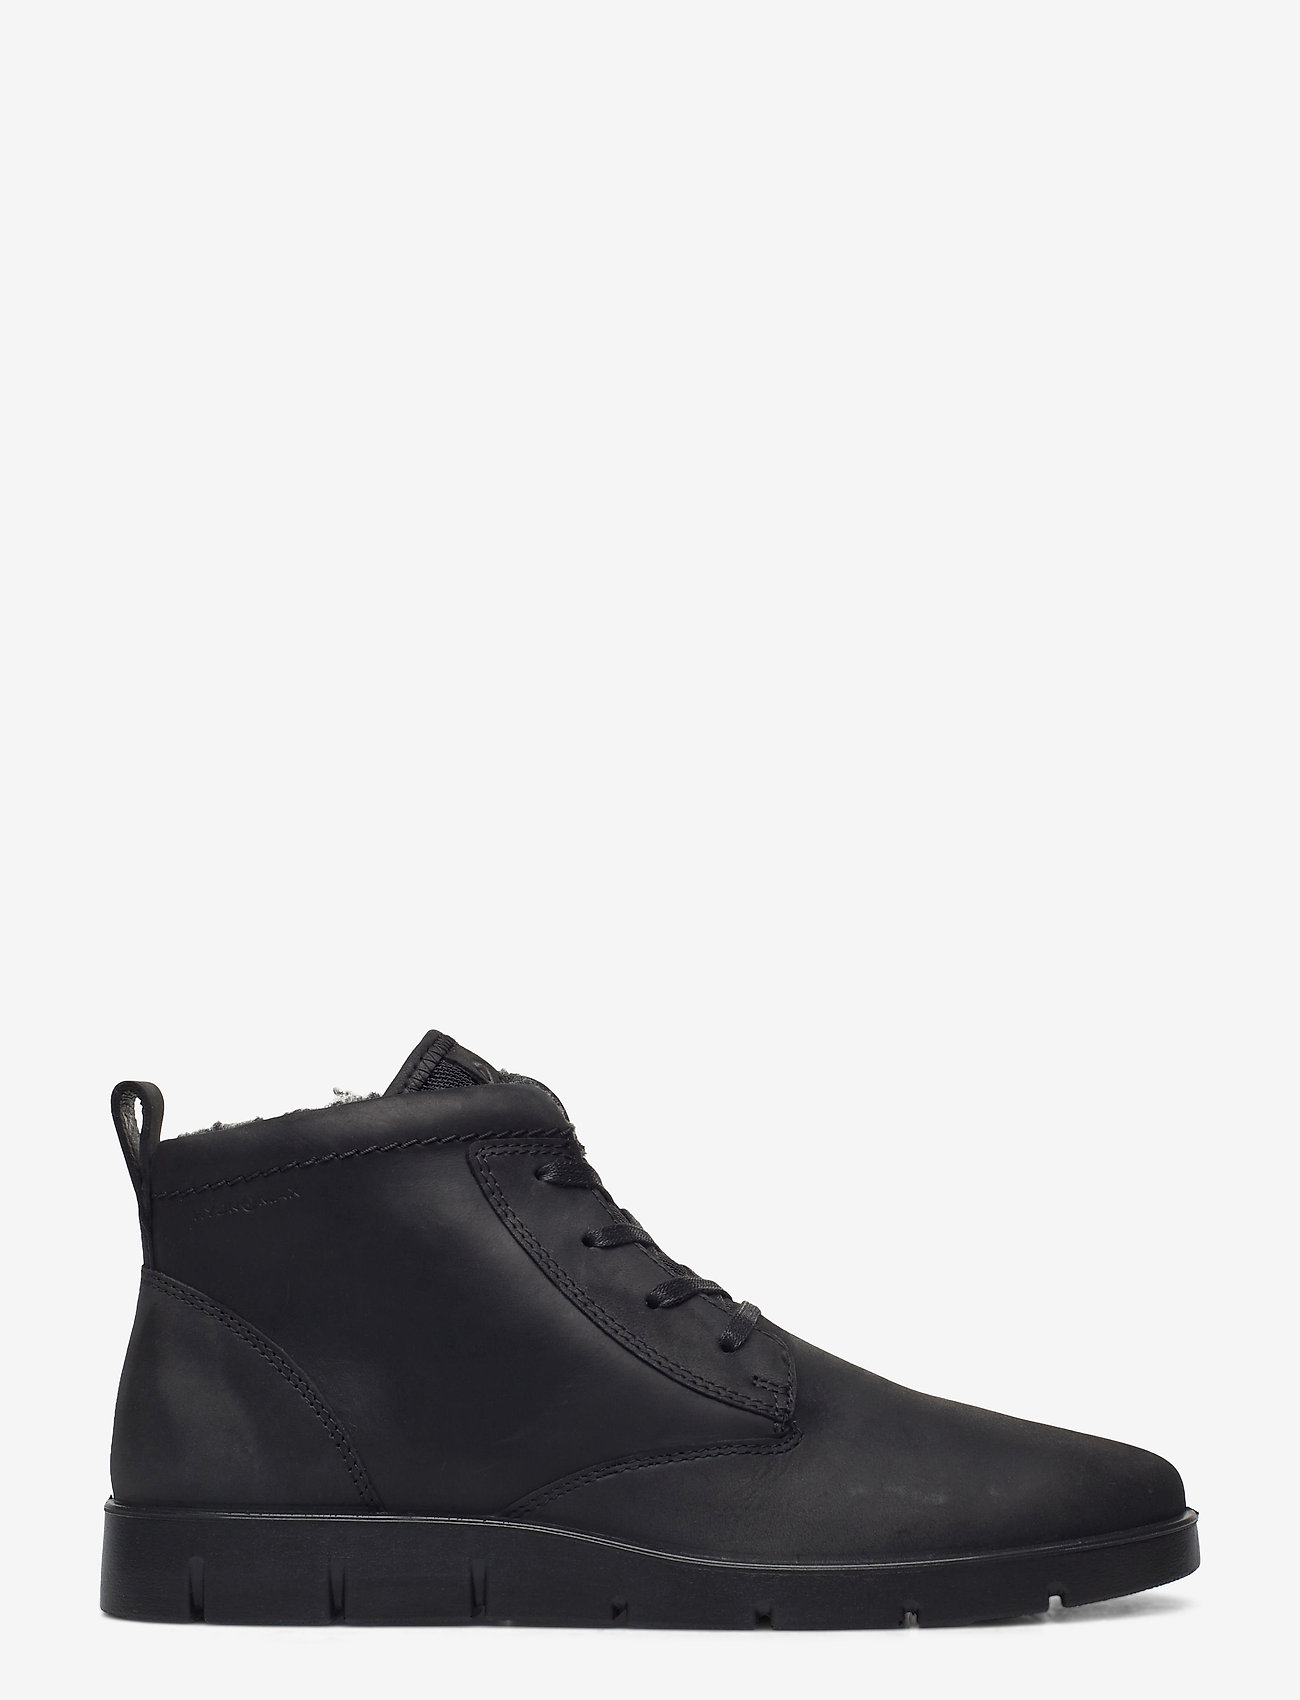 ECCO - BELLA - flat ankle boots - black - 1